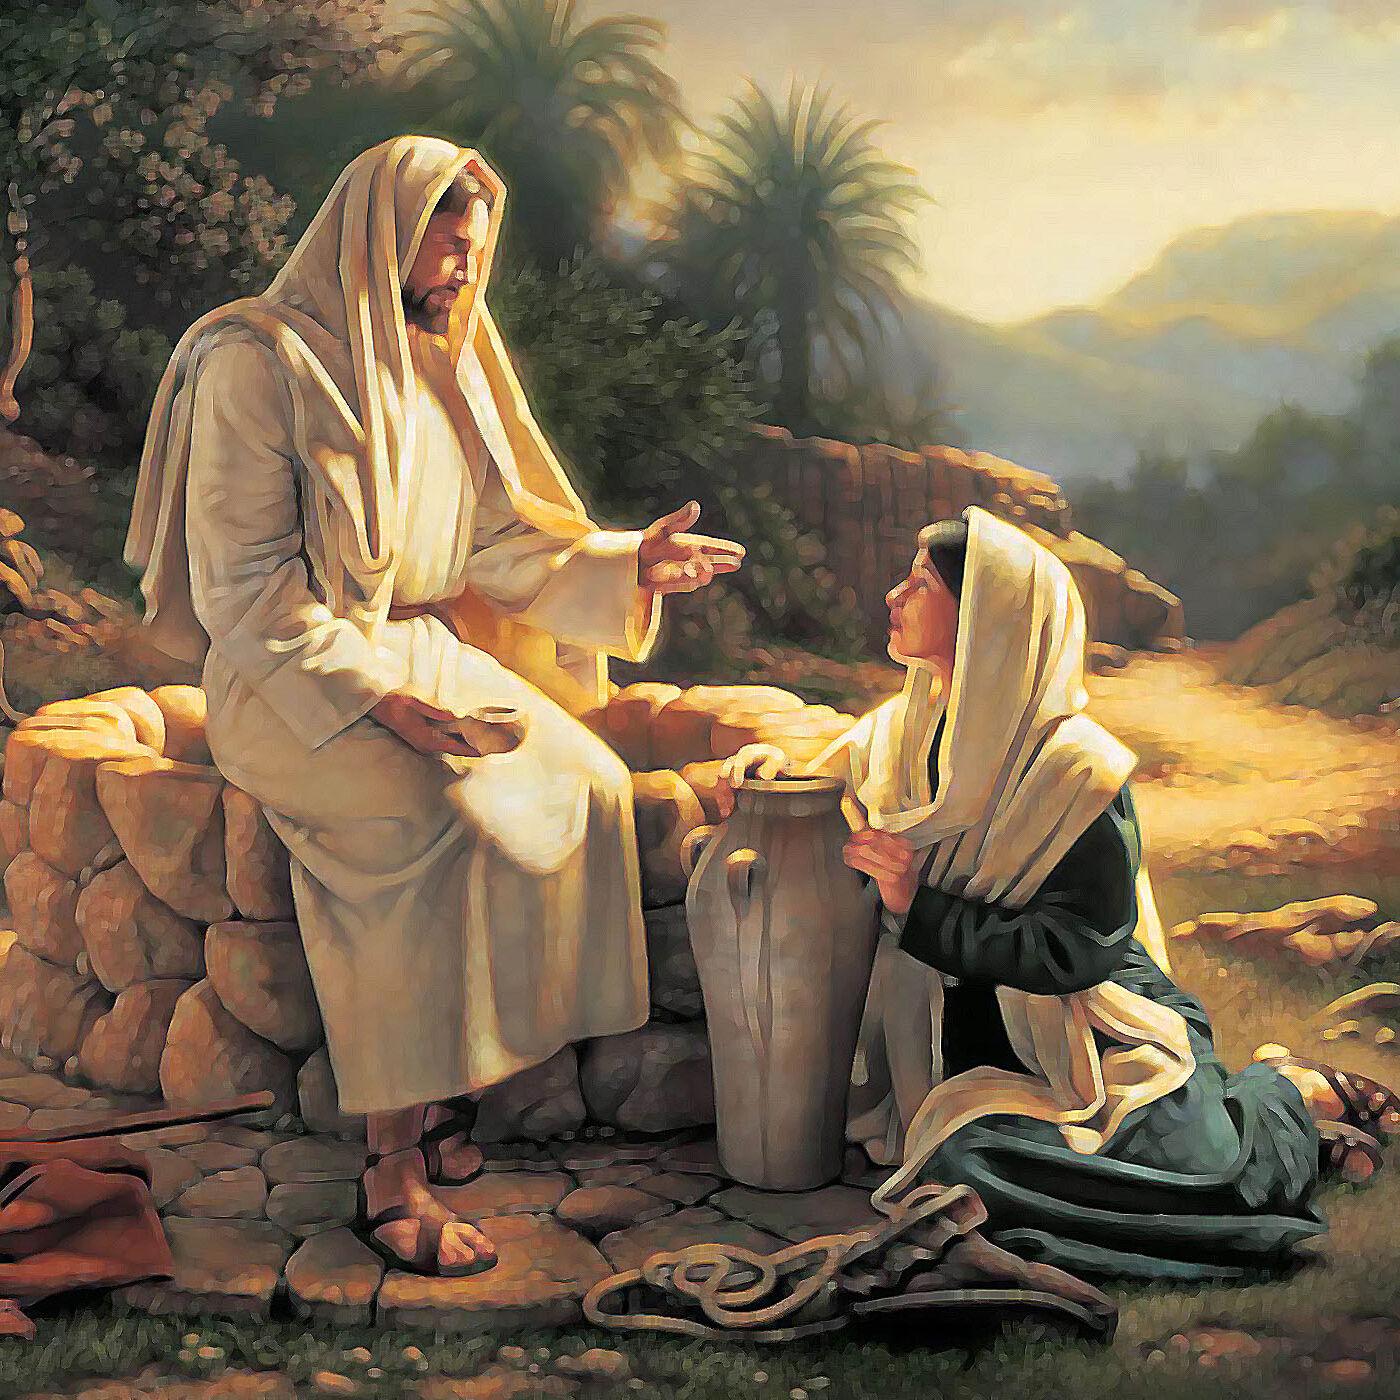 riflessioni sul Vangelo di Venerdì 23 Aprile 2021 (Gv 6, 52-59)